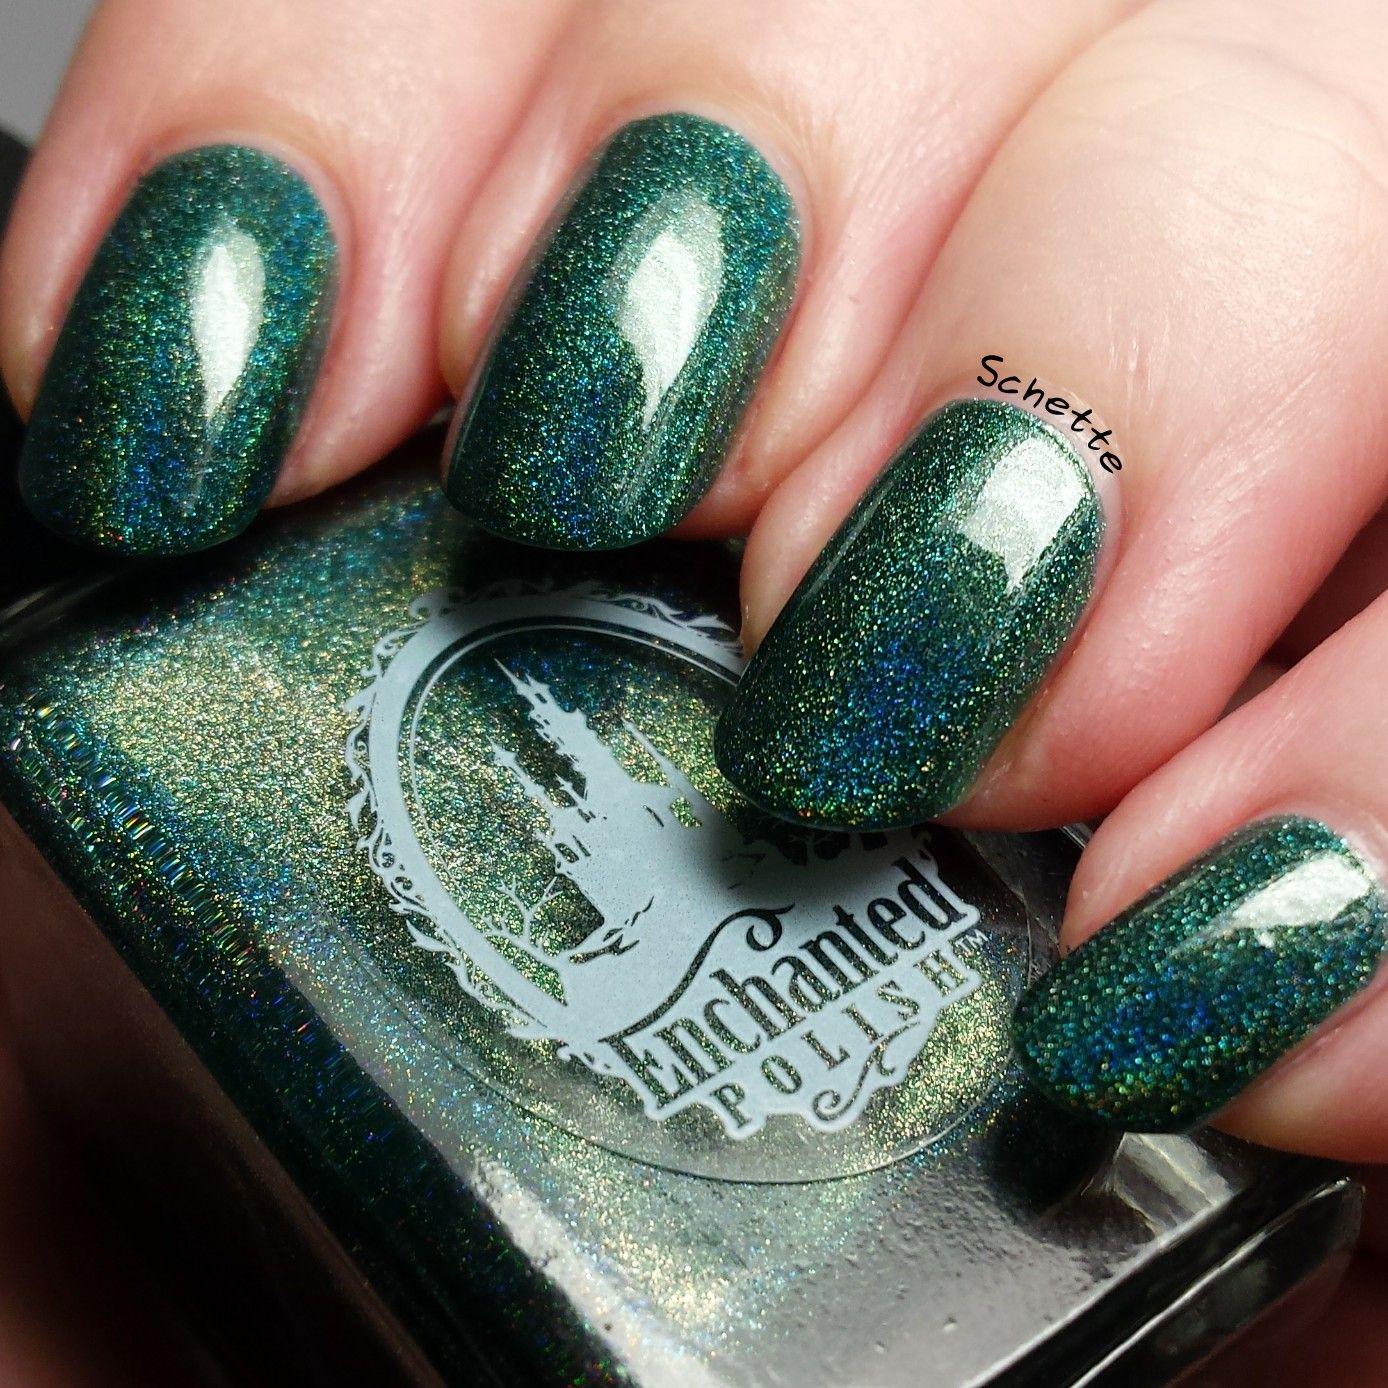 Enchanted Polish : December 2015 | Enchanted polish | Pinterest ...